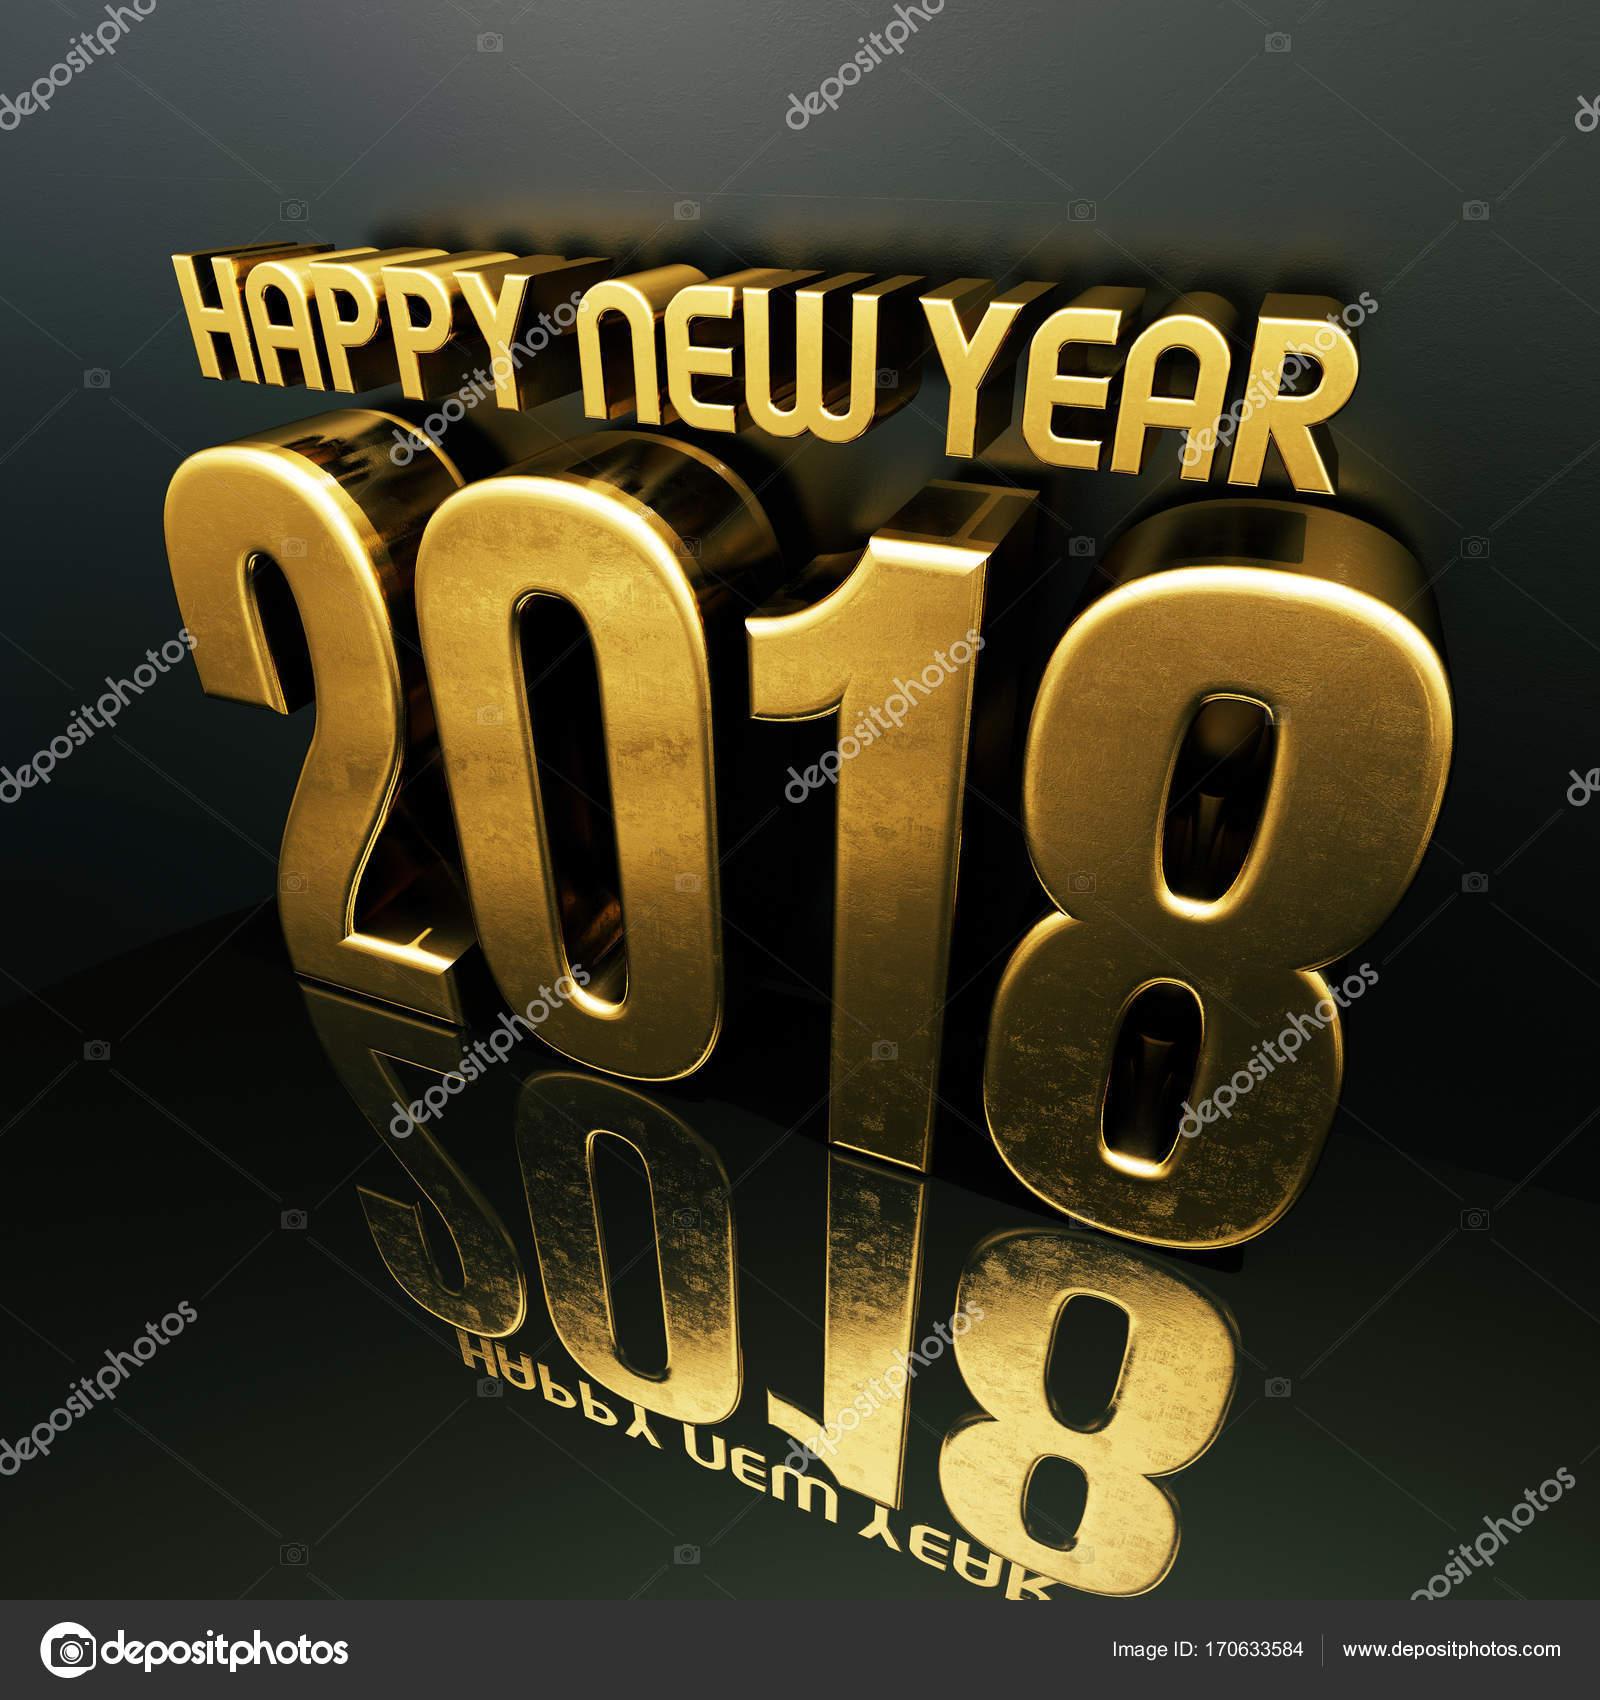 Happy New Year 2018 Text Design 3d Illustration Stock Photo